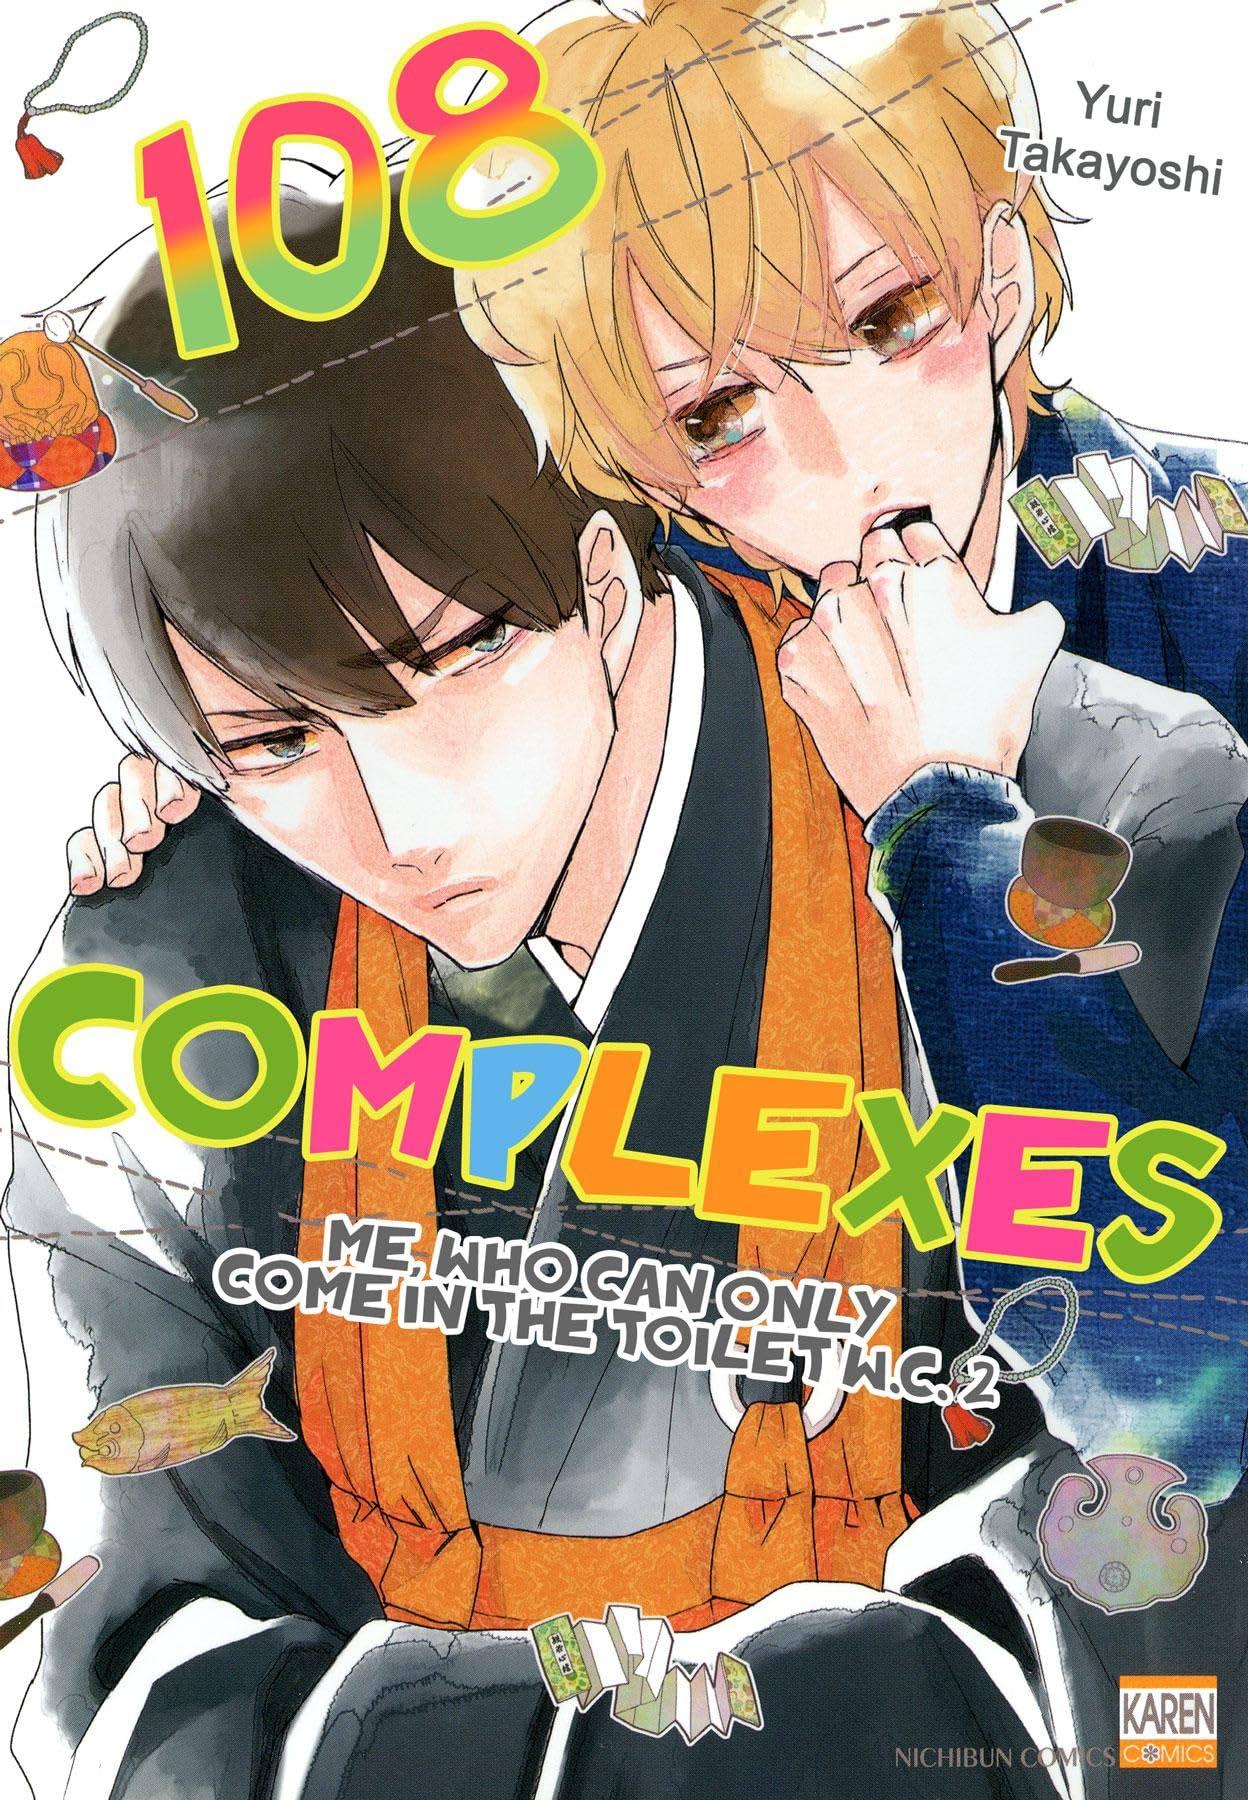 108 Complexes #5